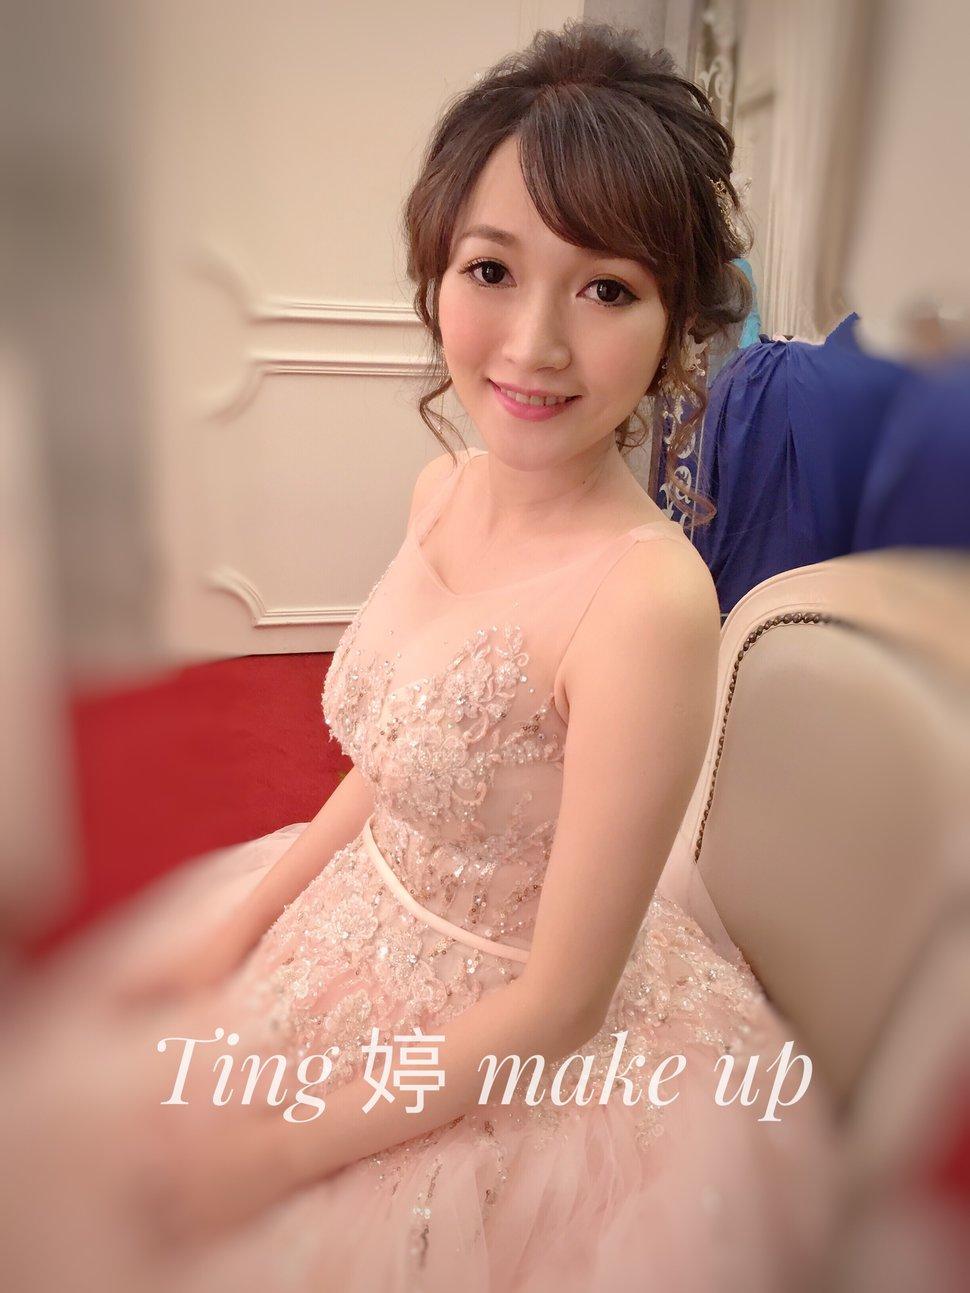 image - Ting婷 make up studio - 結婚吧